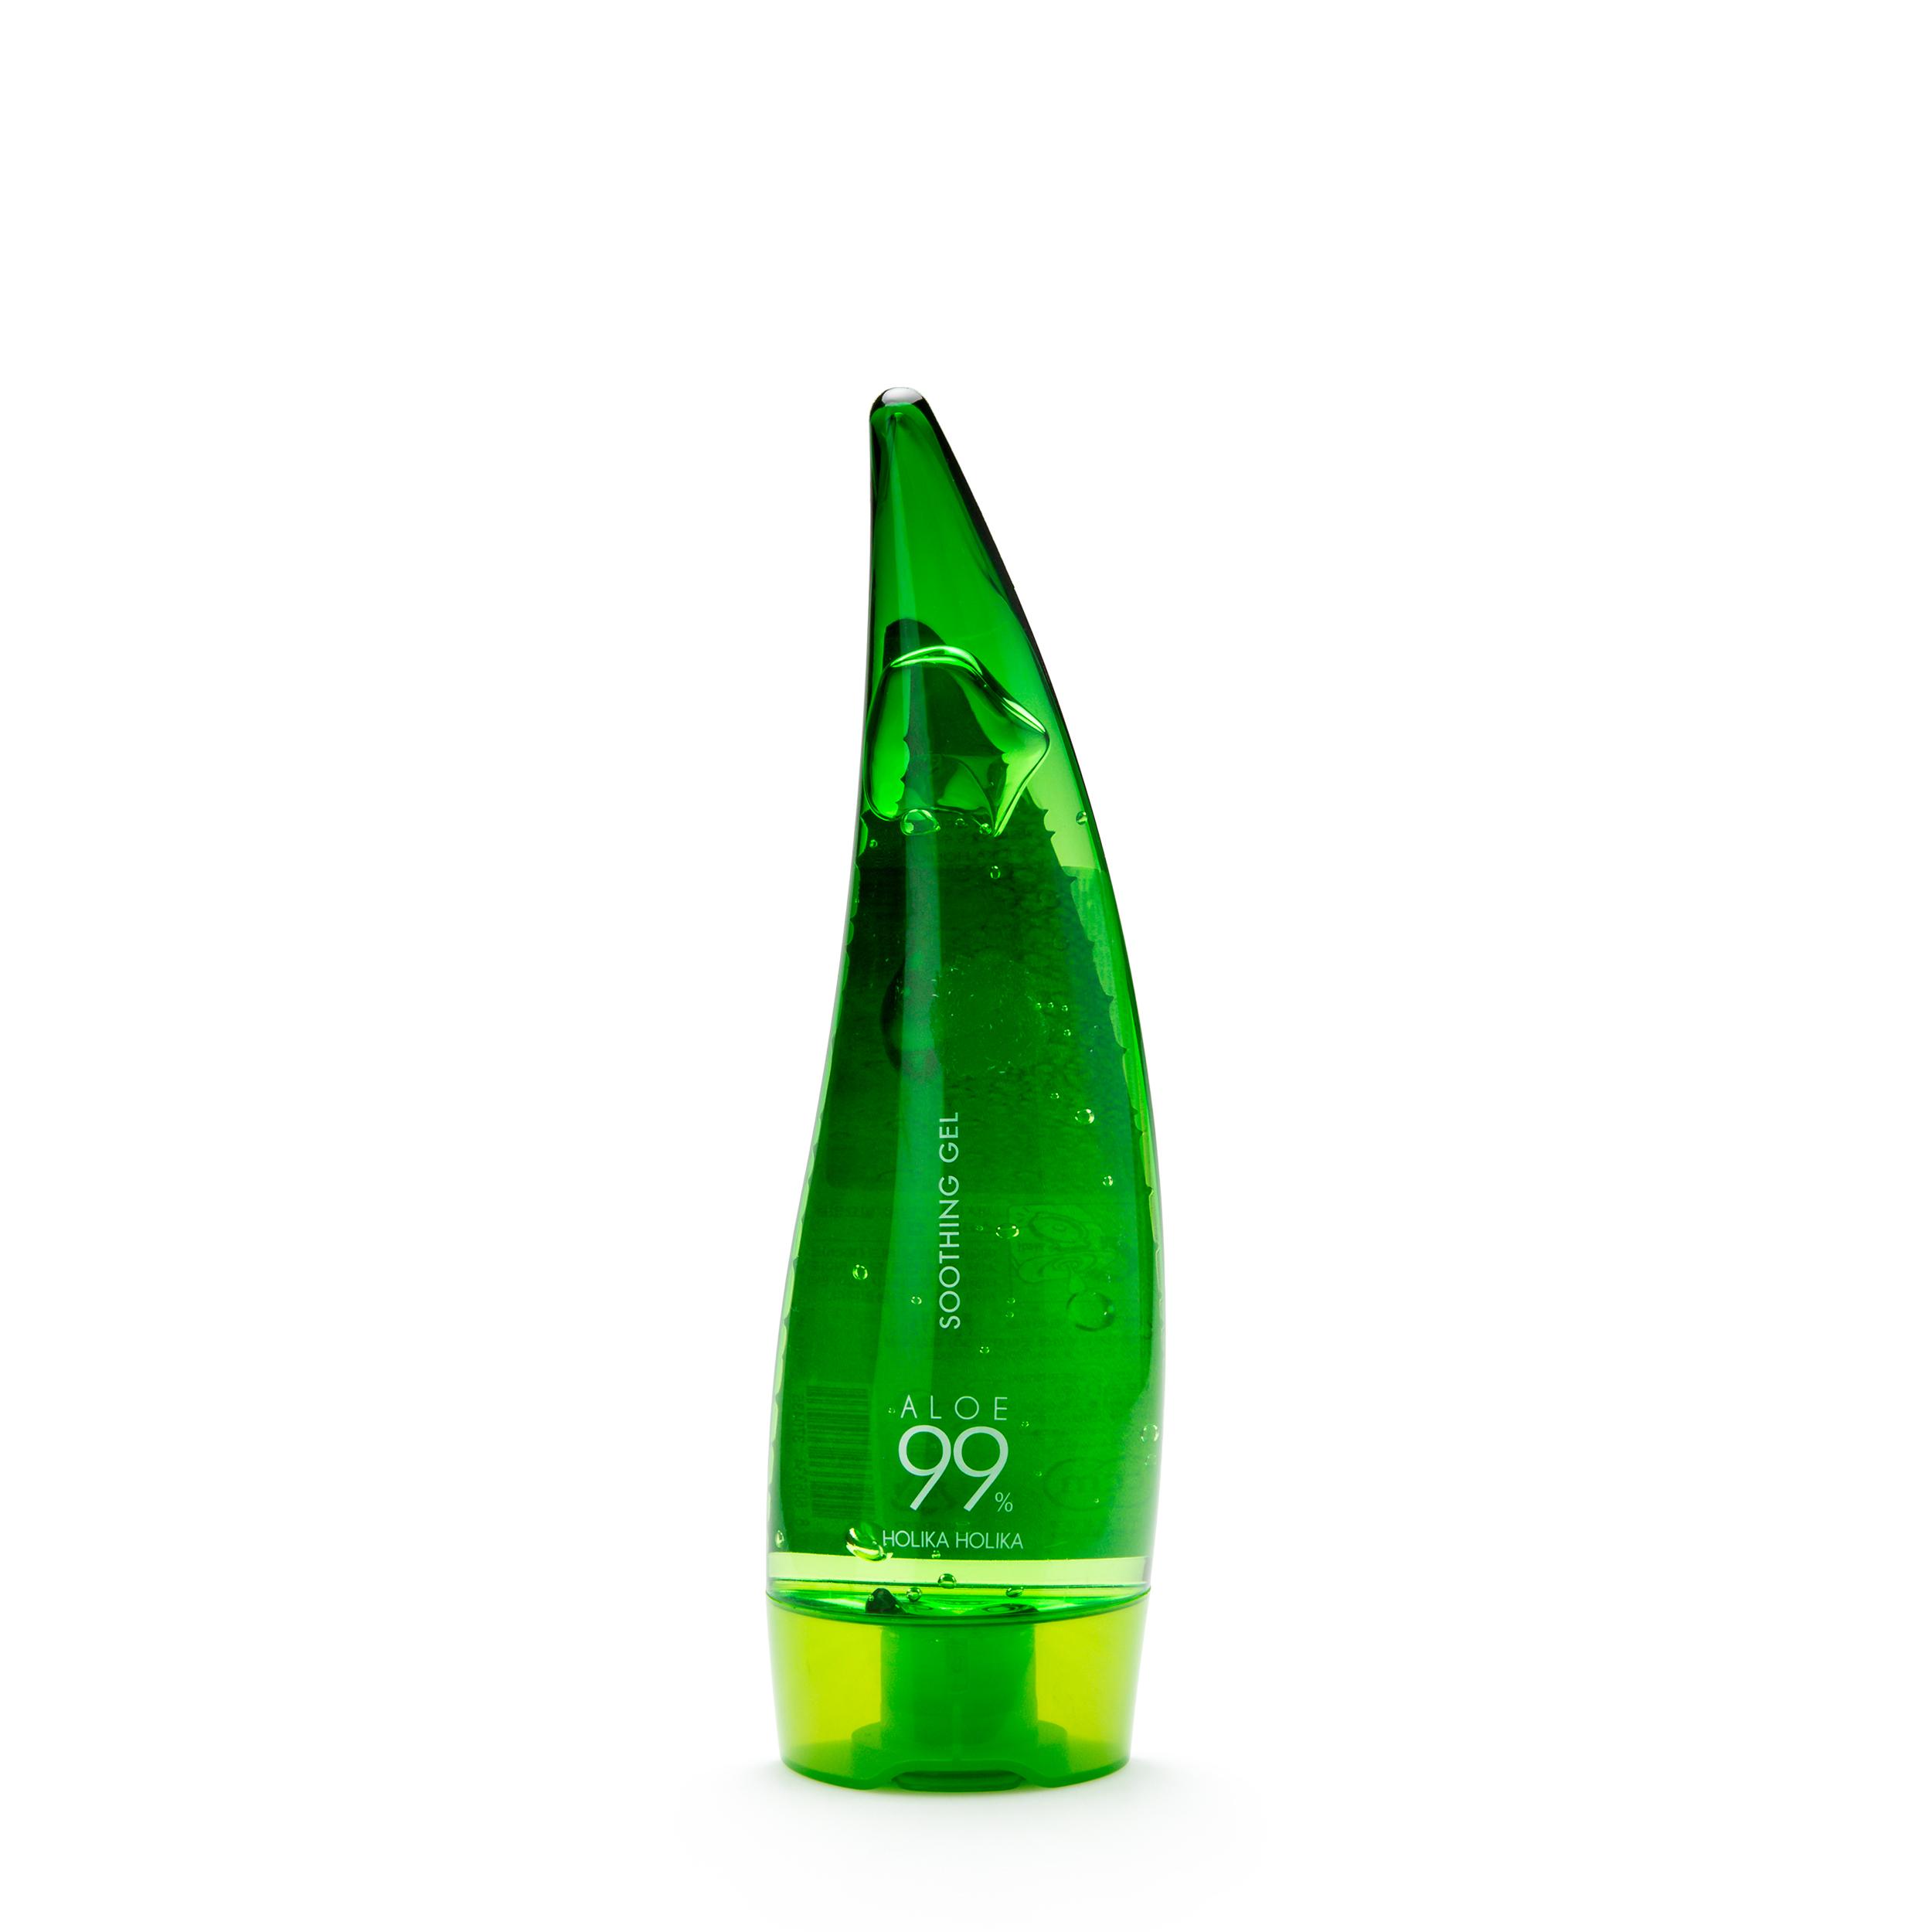 Holika Holika Универсальный гель «Aloe 99%» 250 мл фото